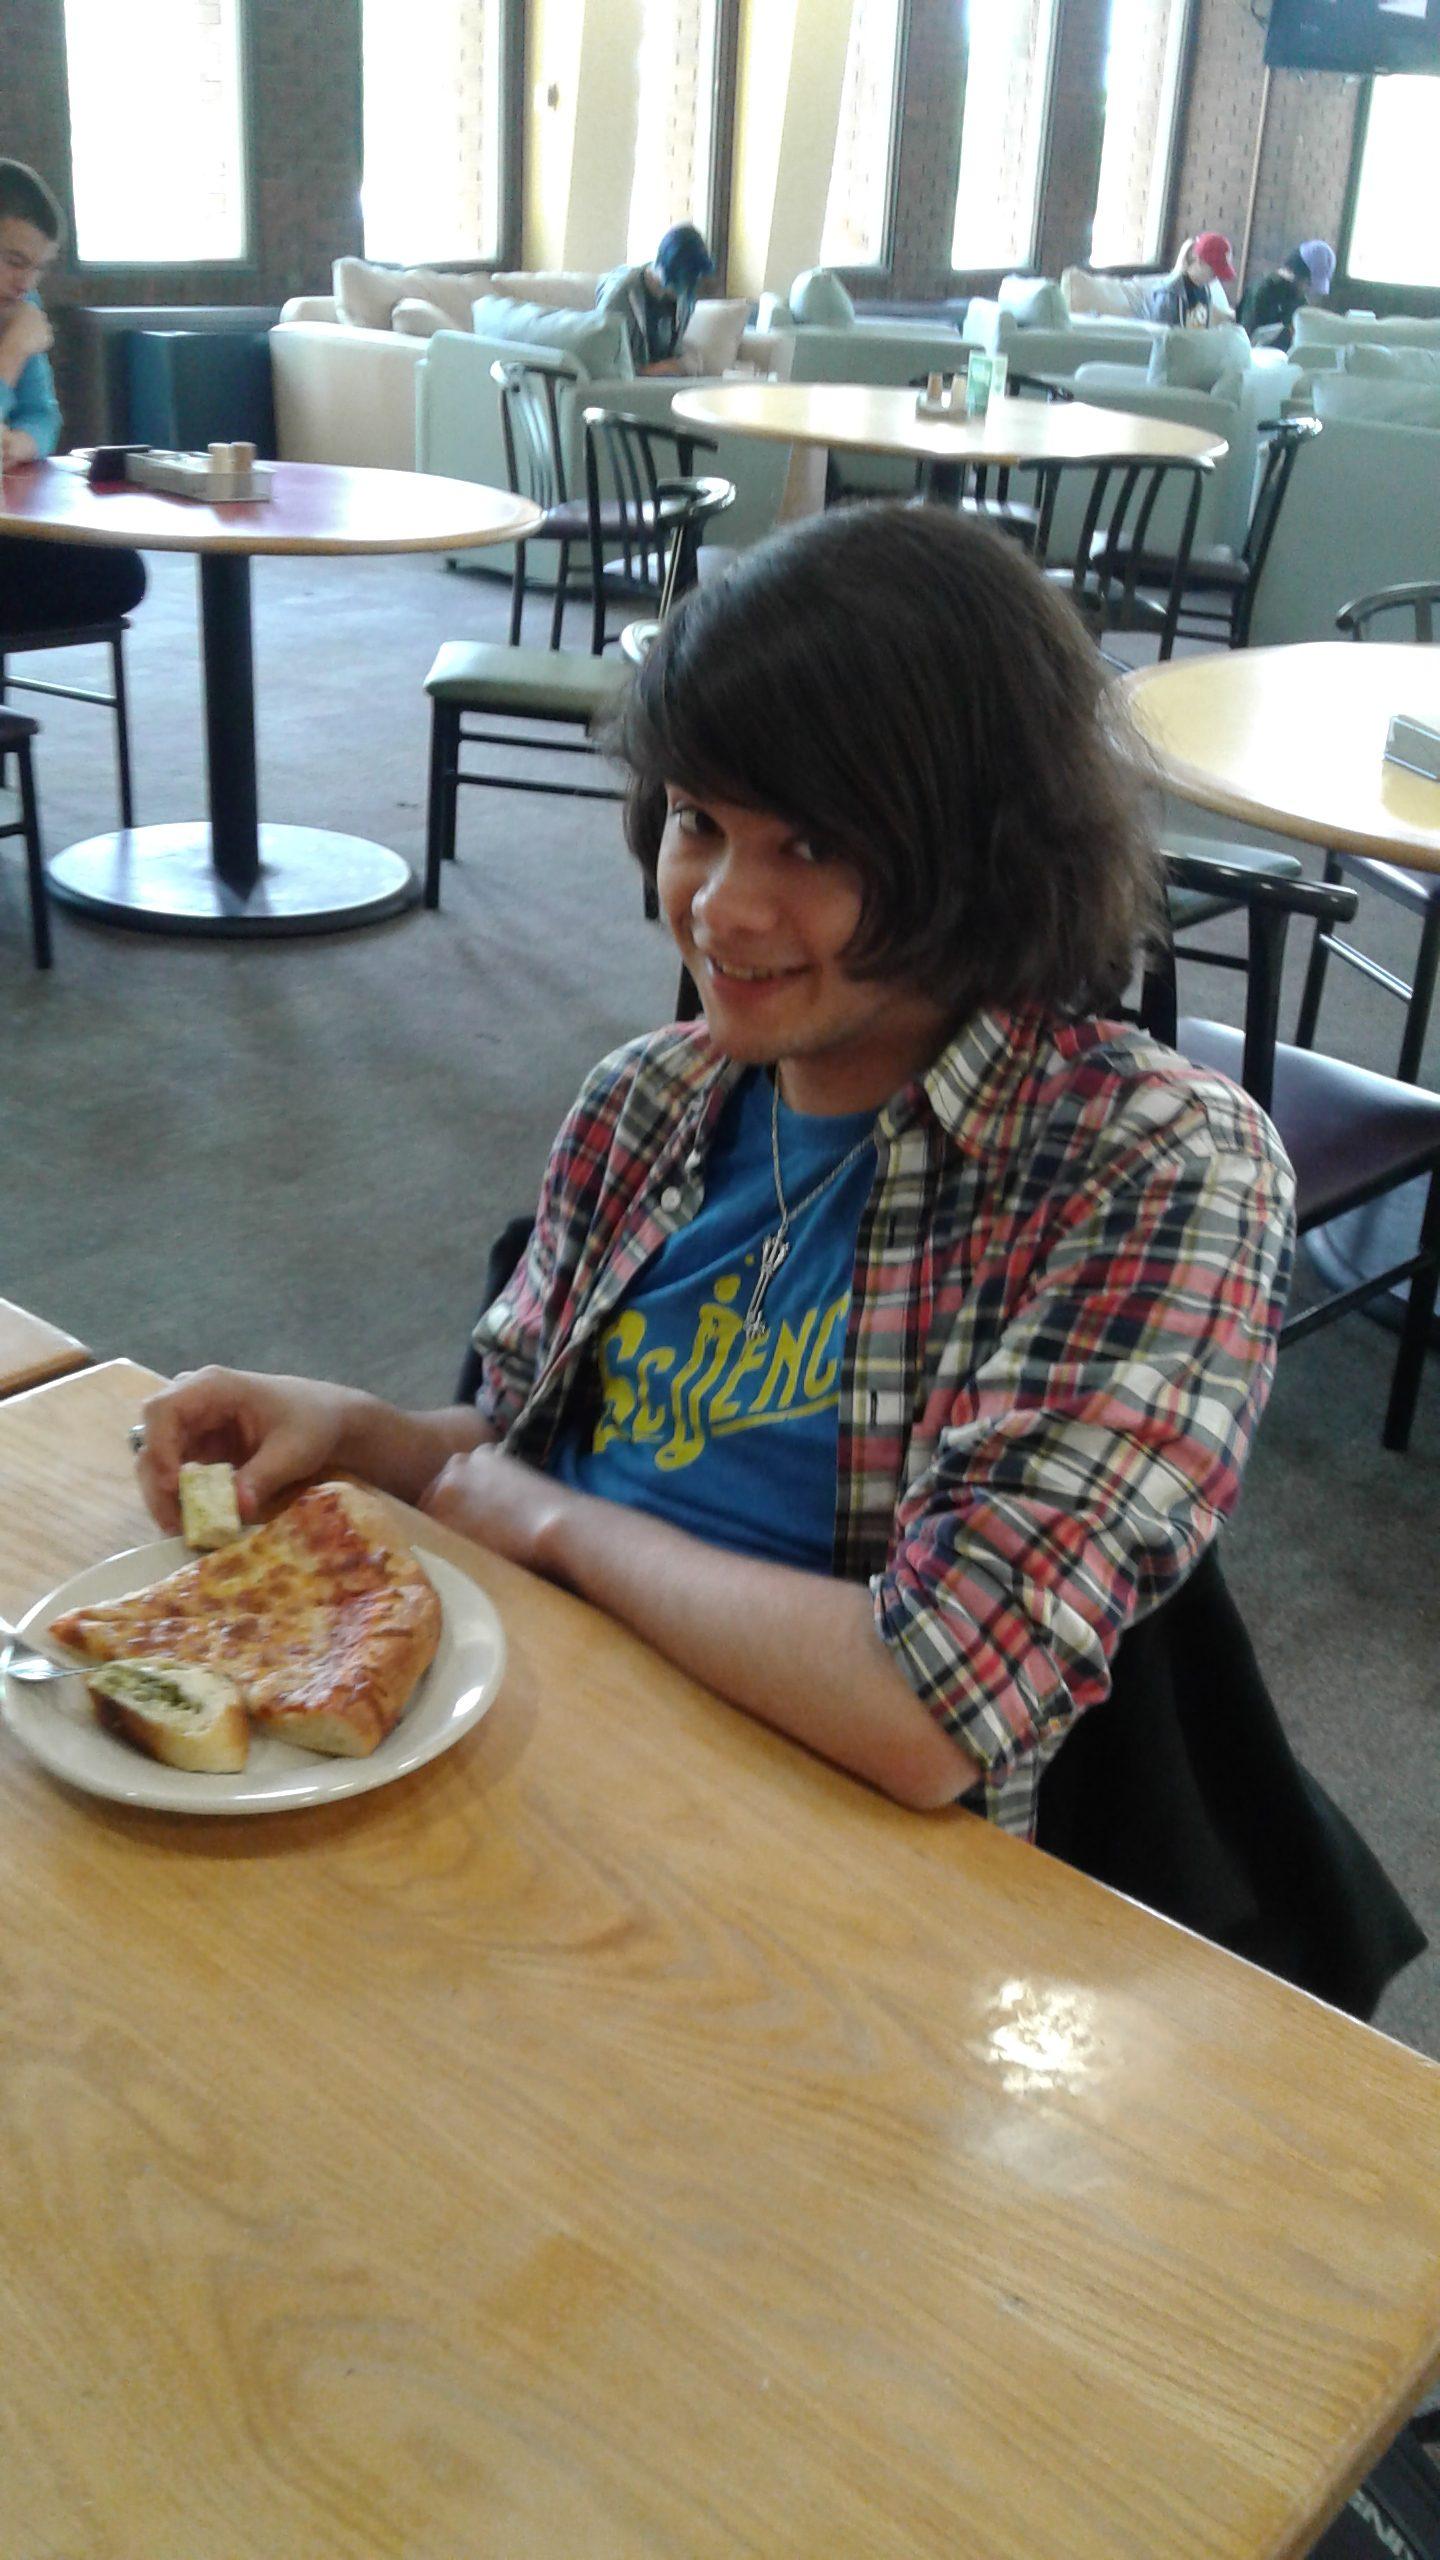 Anthony Deleon poses with pizza